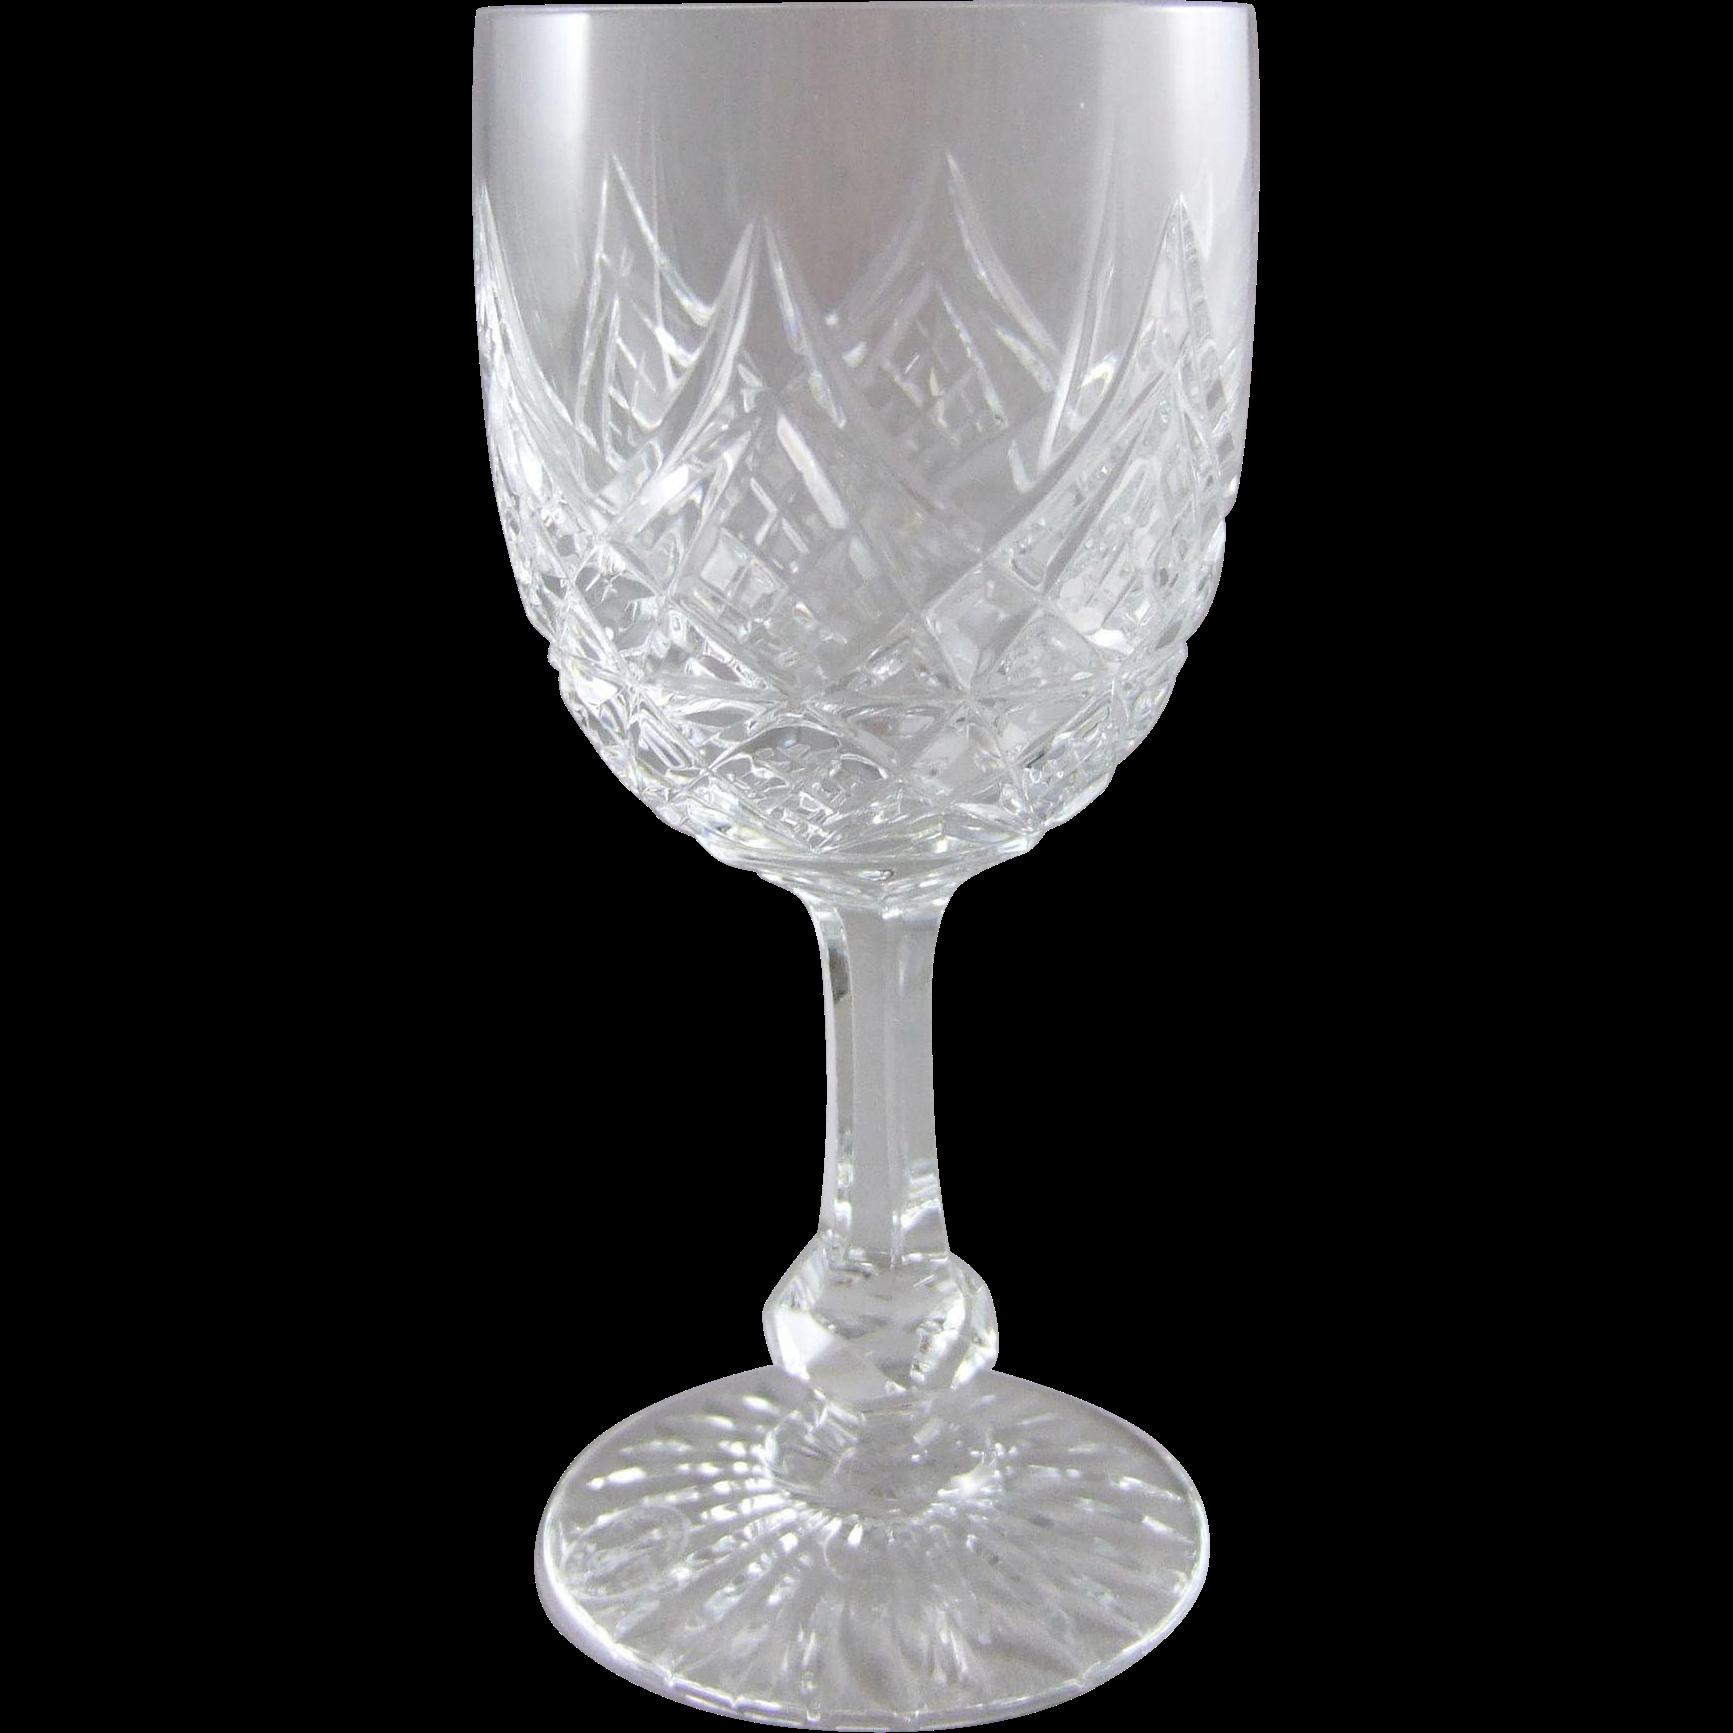 baccarat france cut crystal wine glass